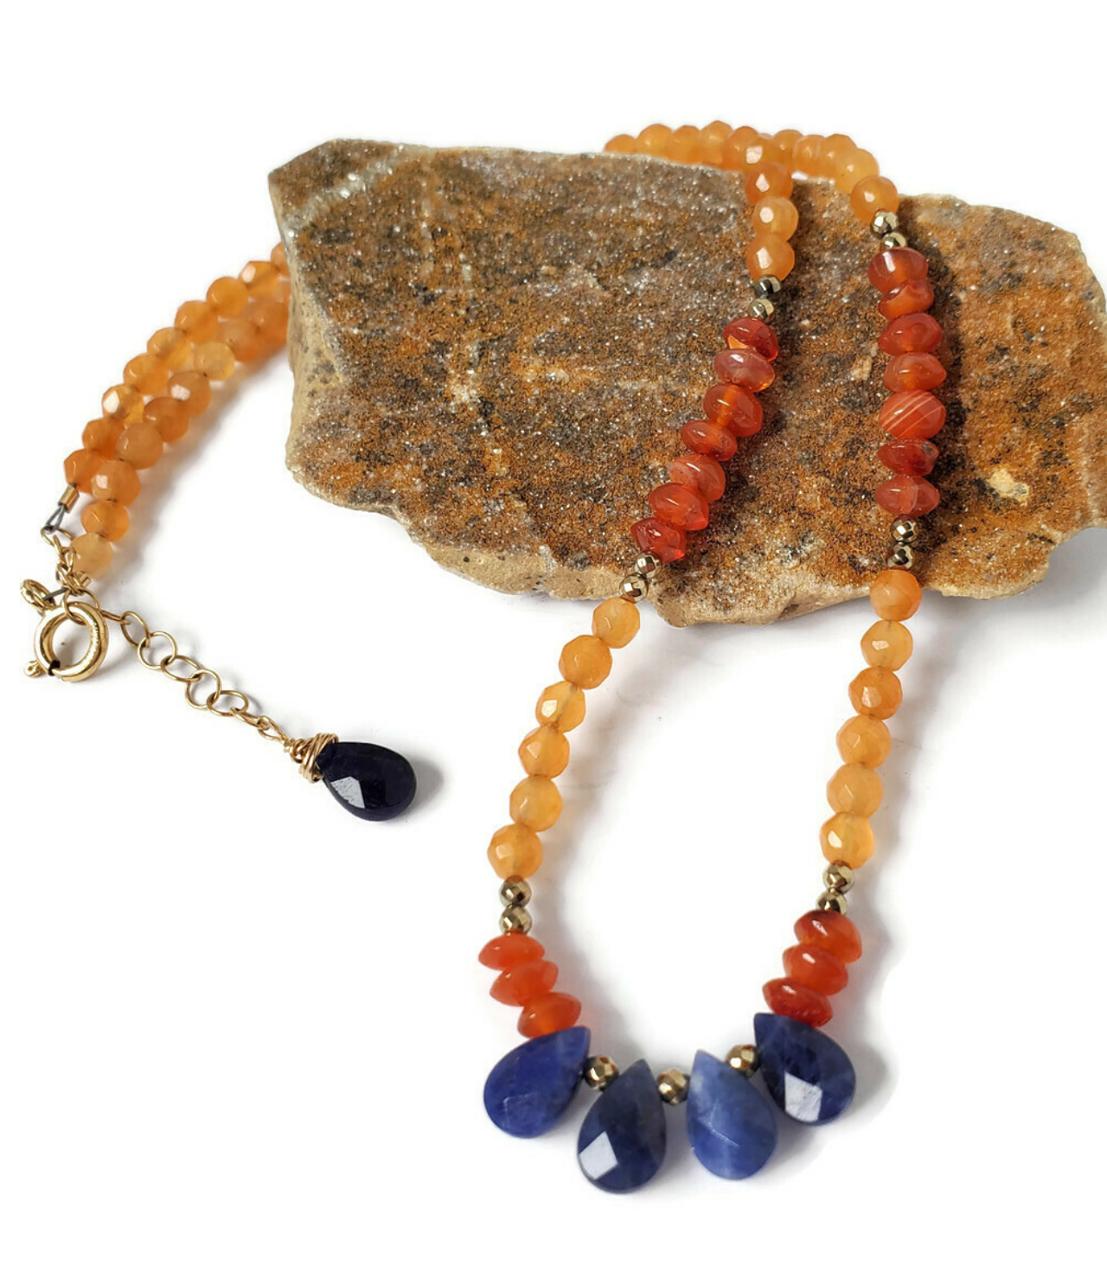 orange  & blue gemstone collar necklace on rock